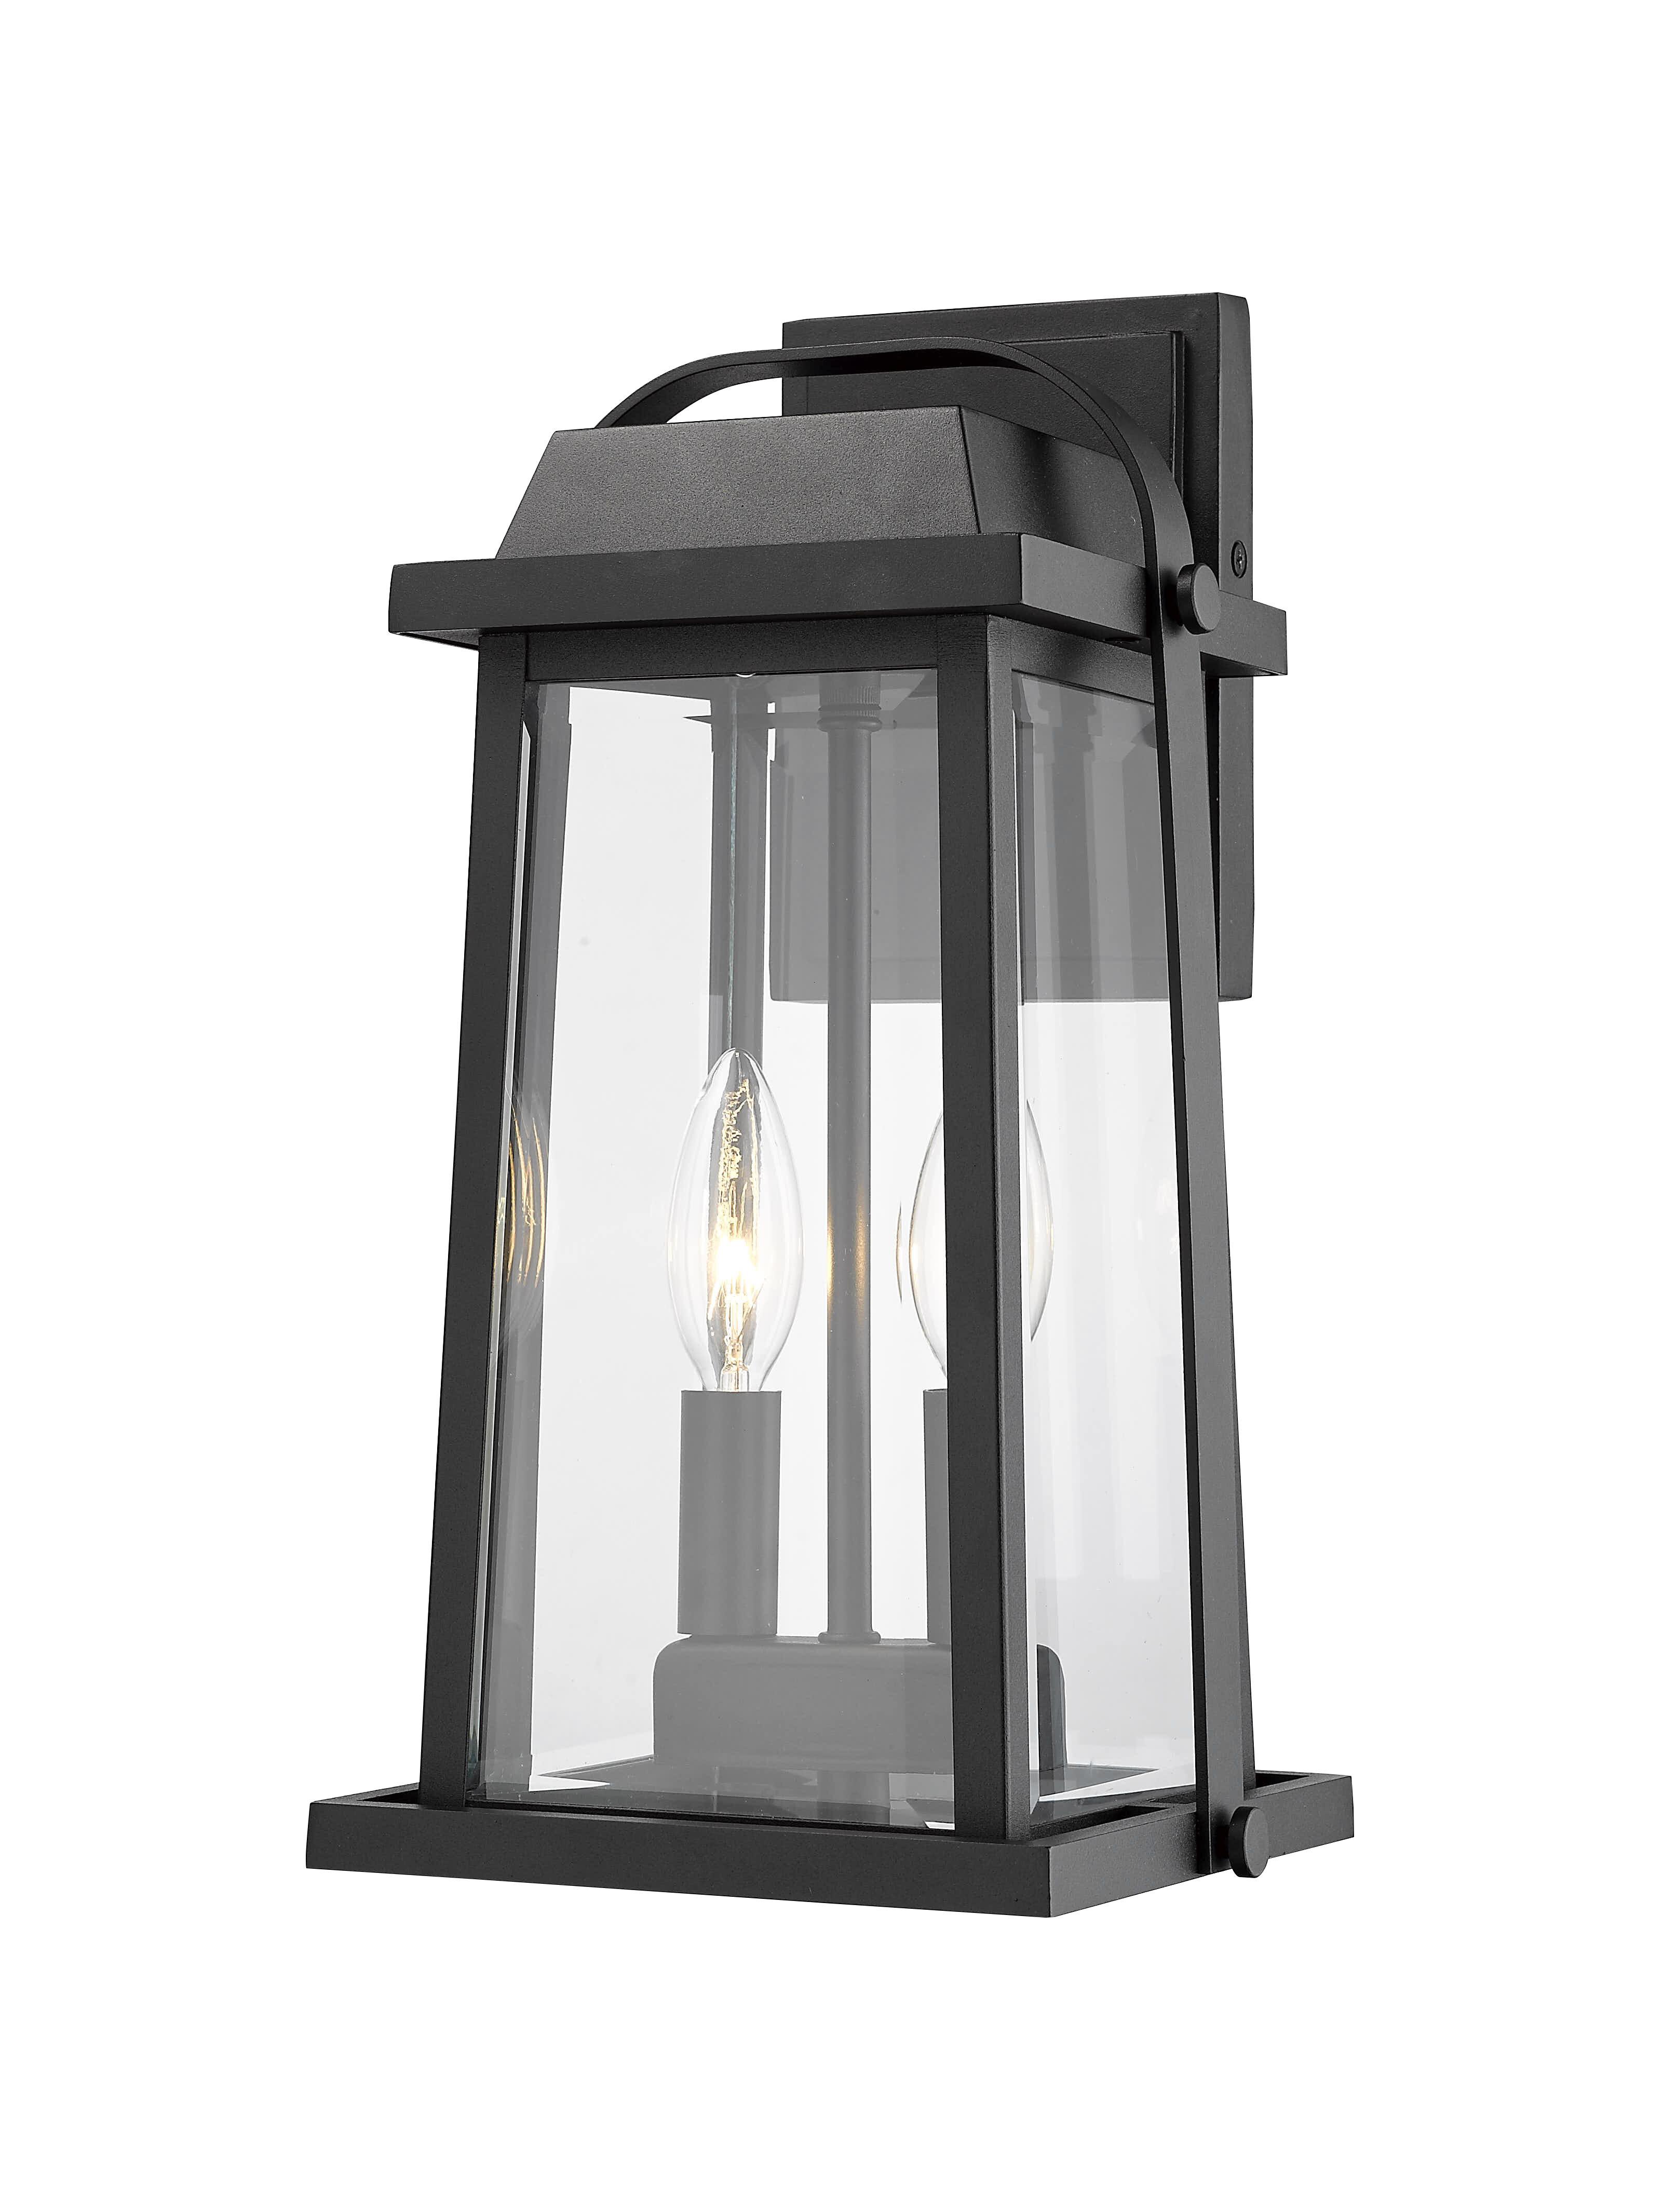 Breakwater Bay Sisto 2 Light Outdoor Wall Lantern Reviews Wayfair